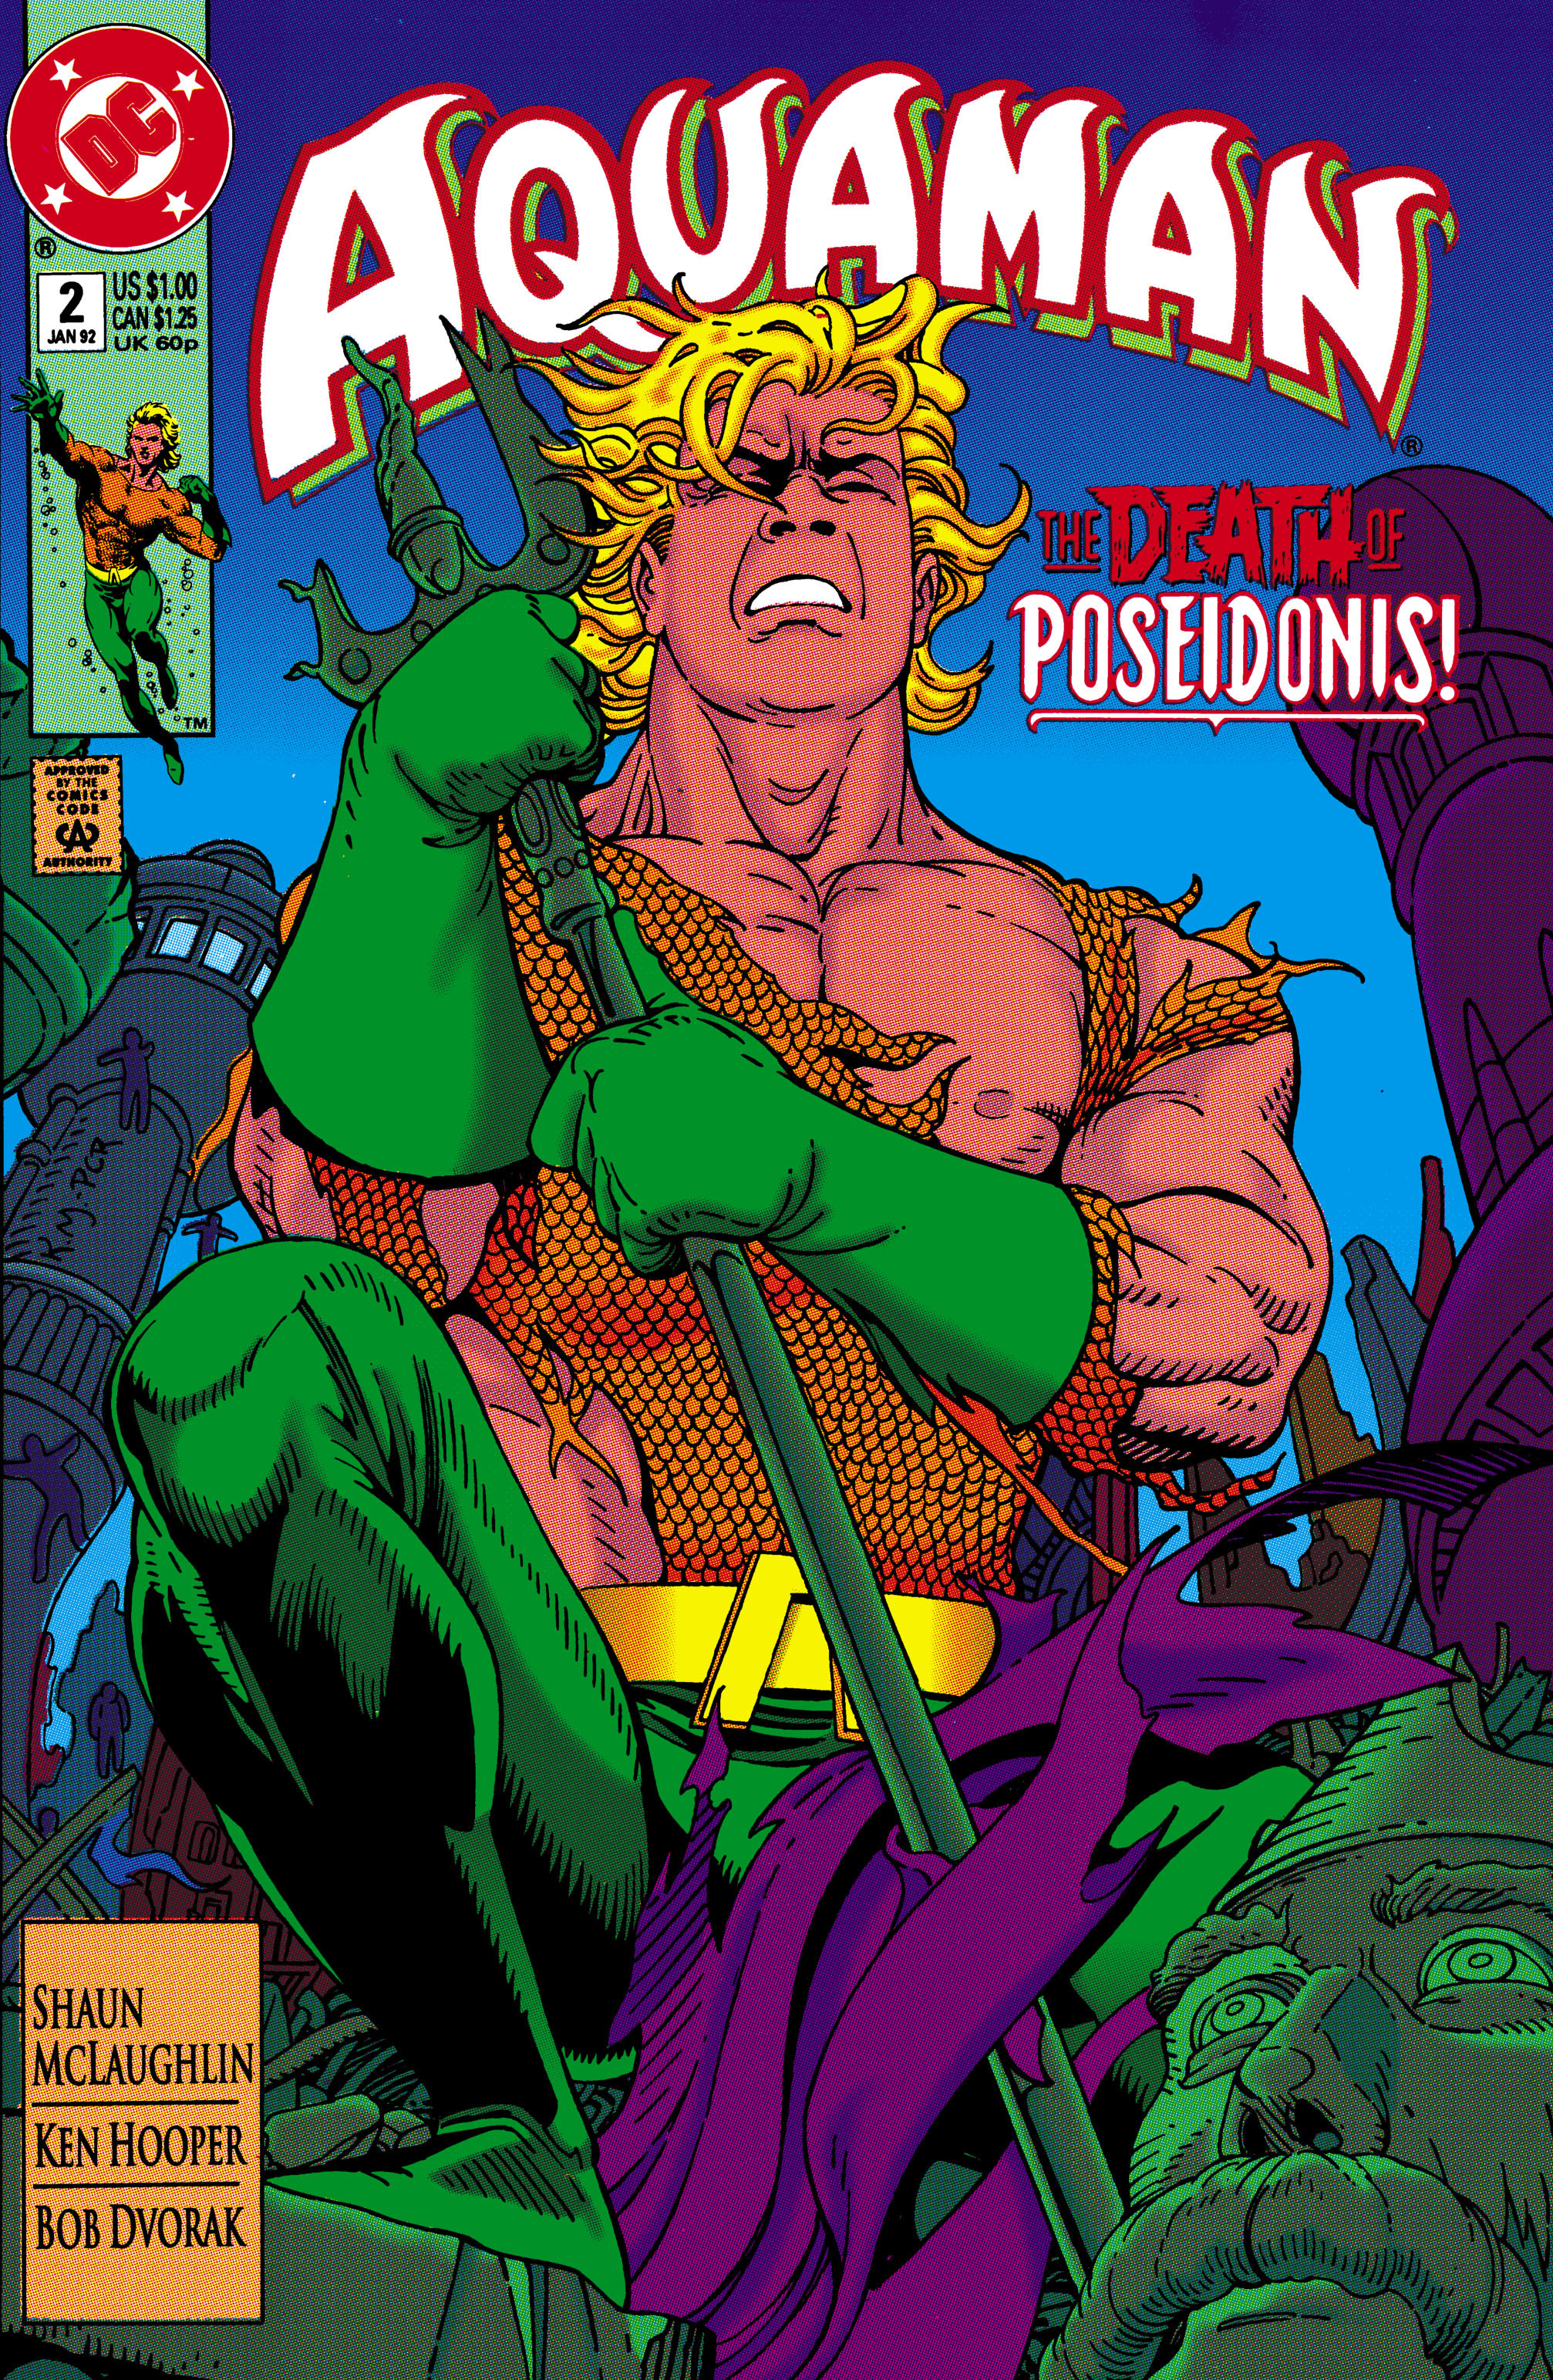 Read online Aquaman (1991) comic -  Issue #2 - 1